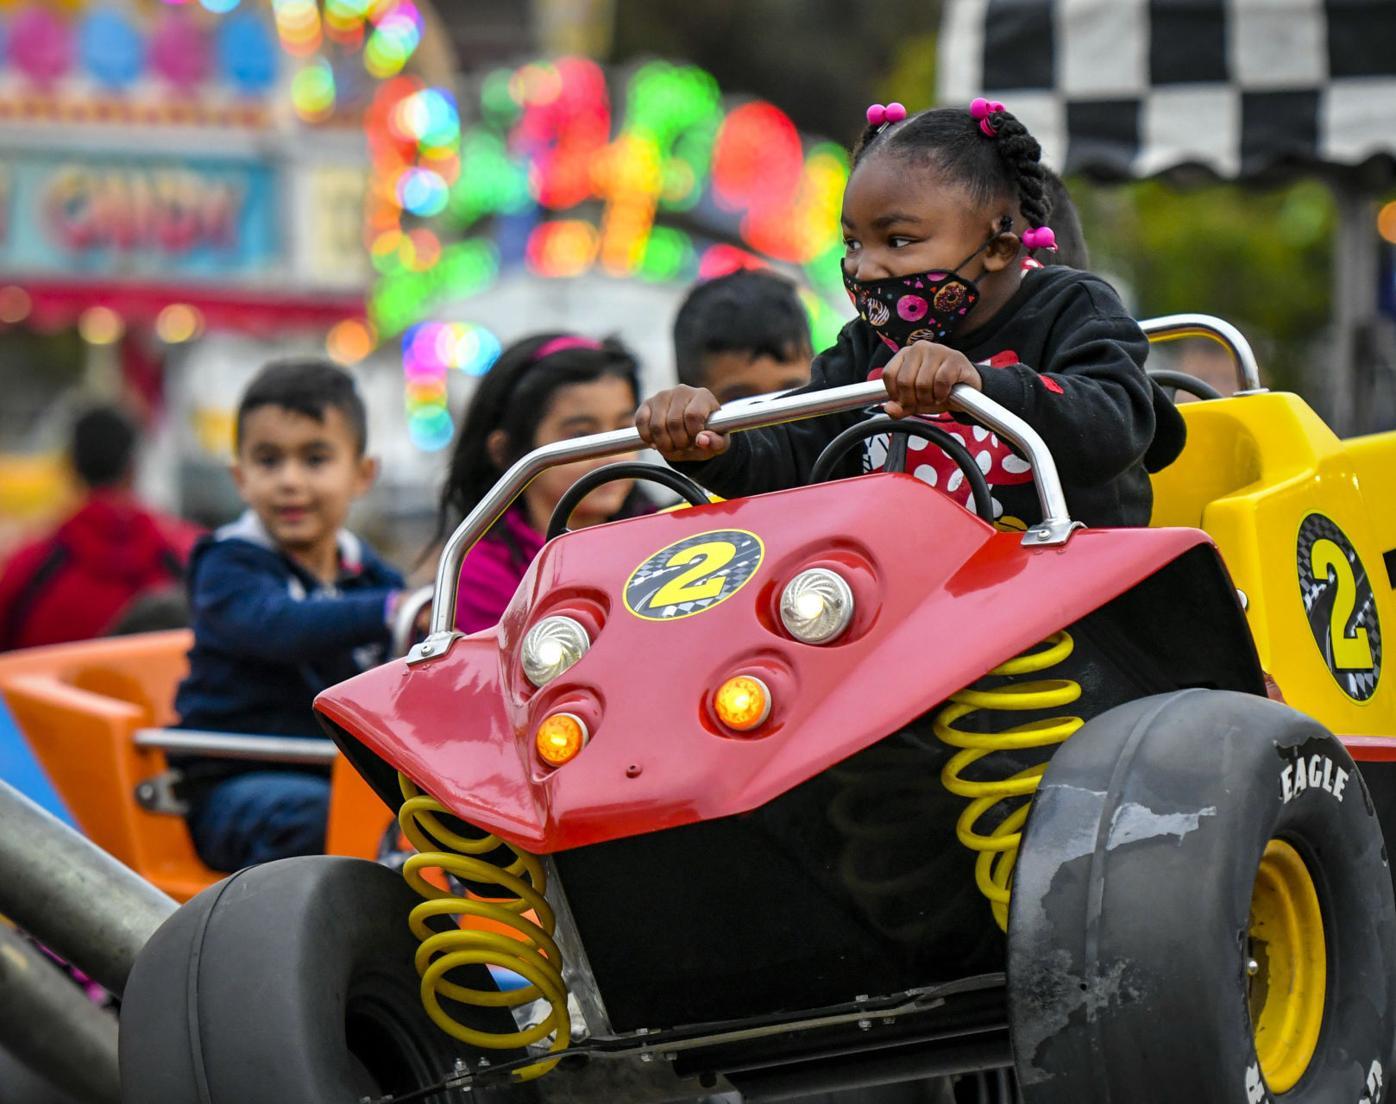 060321 Lompoc Carnival 02.JPG